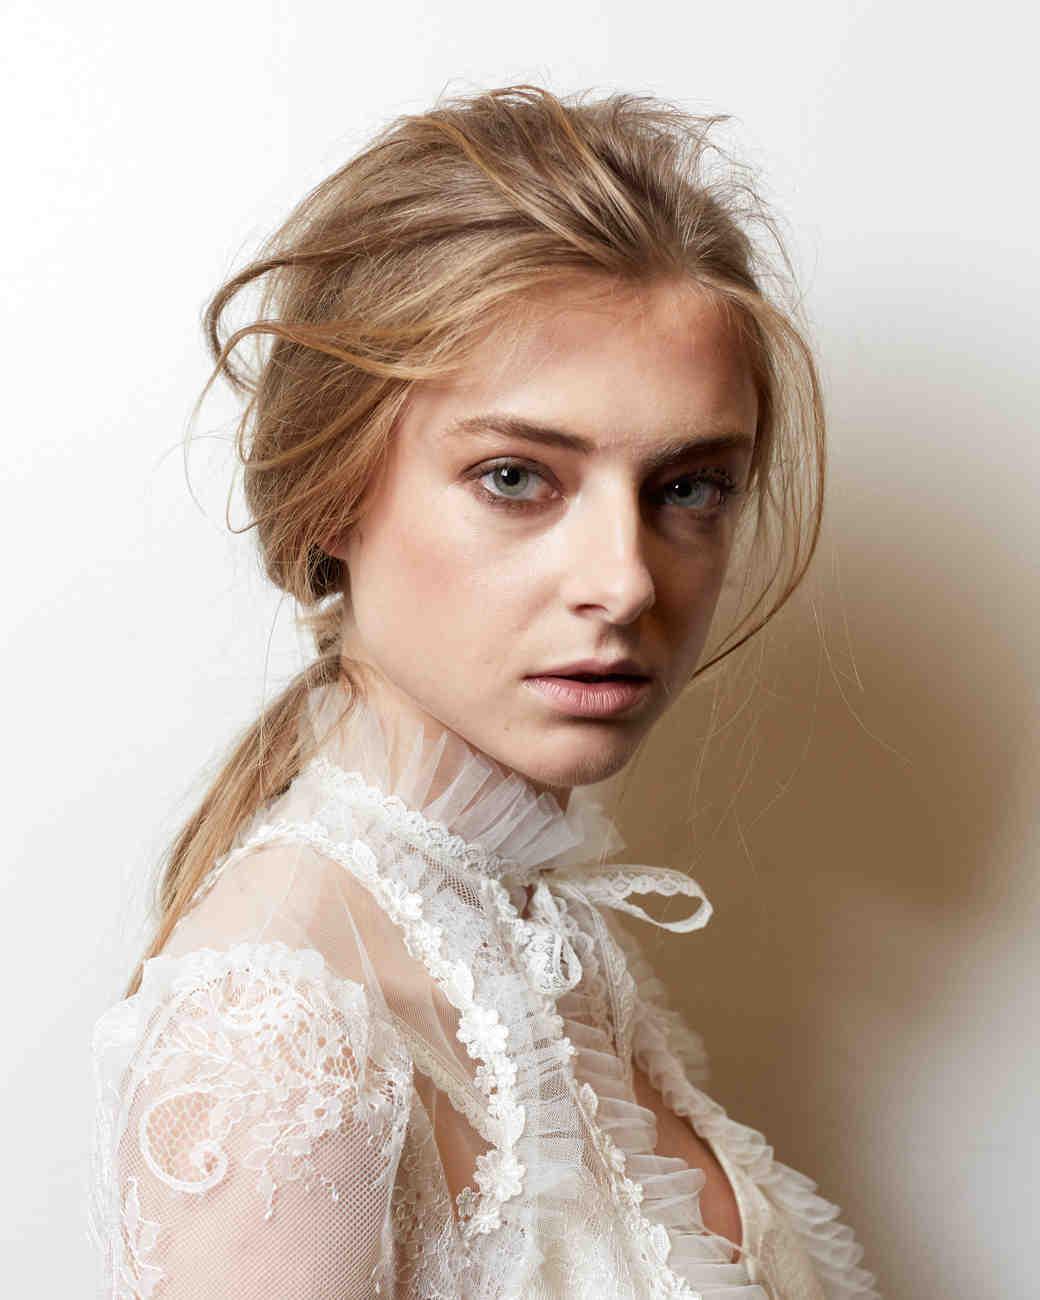 expert-beauty-tips-claire-pettibone-spring2016-lipstick-0415.jpg